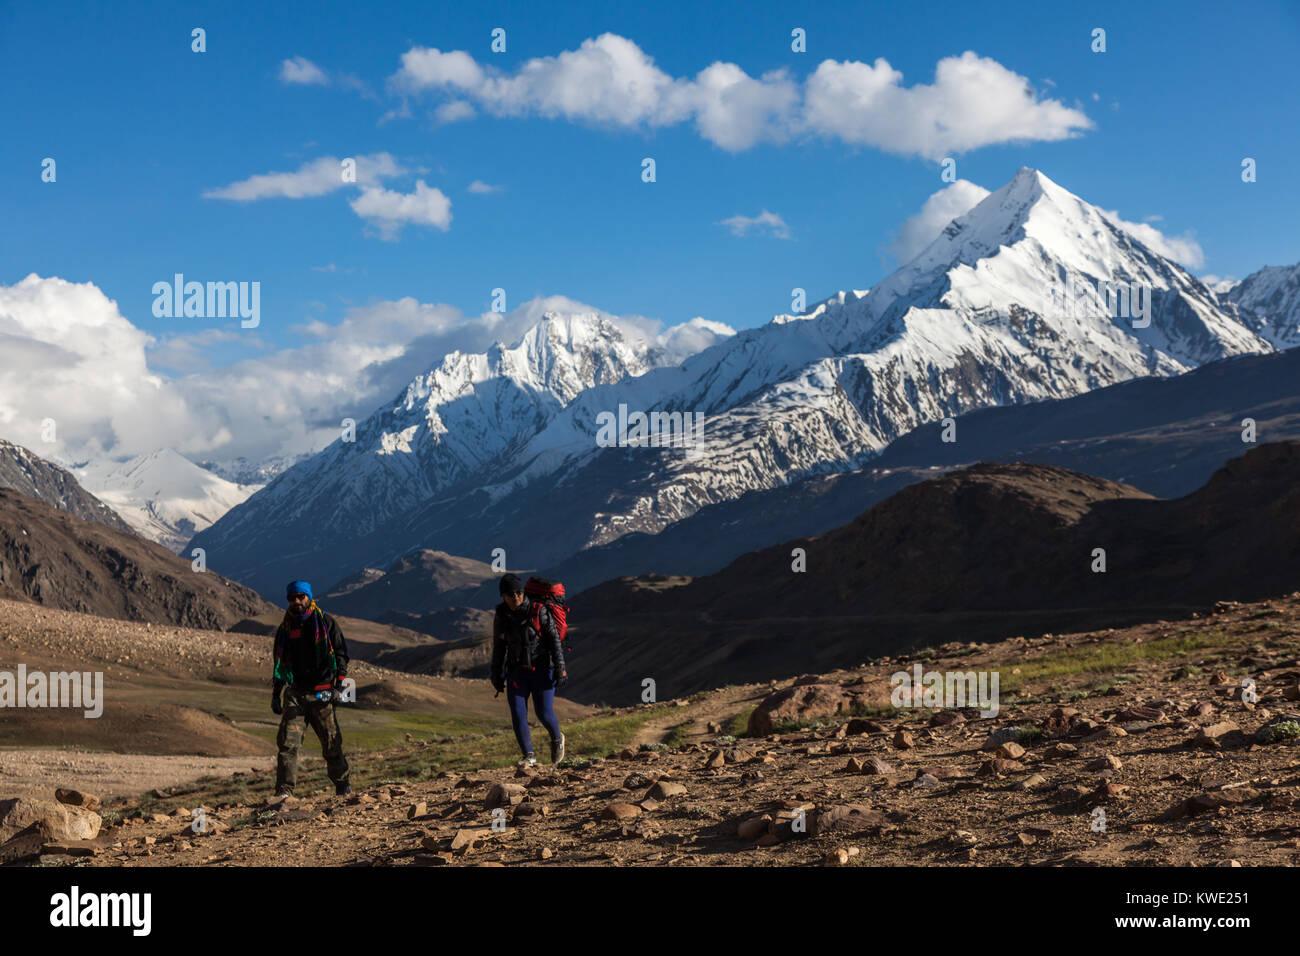 Trekkers walking upto Chandrataal lake from the campsite in Spiti Valley, Himachal Pradesh. - Stock Image